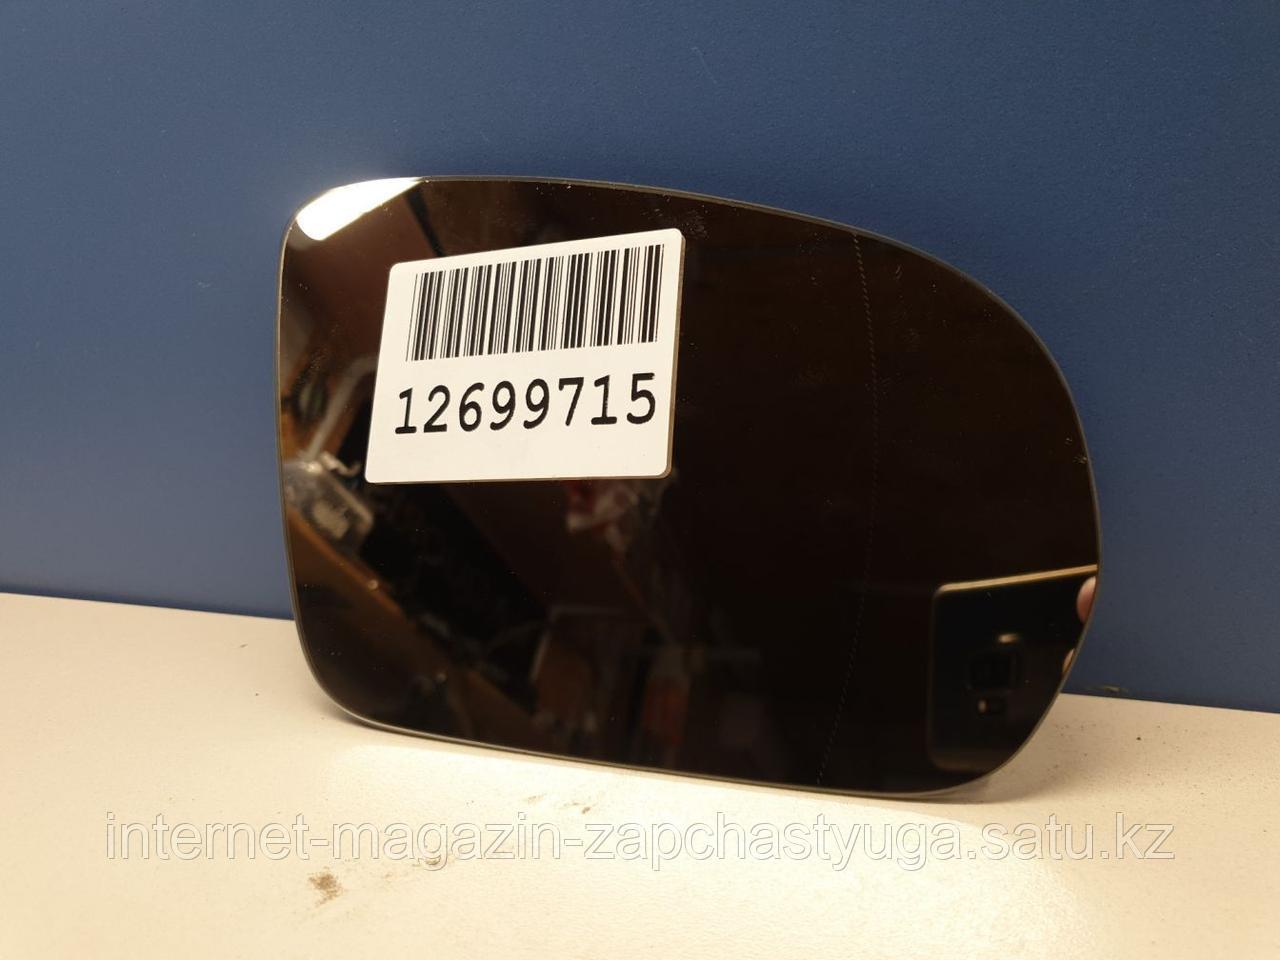 A0998100016 Зеркальный элемент правый для Mercedes S-klasse W222 2013-2020 Б/У - фото 6